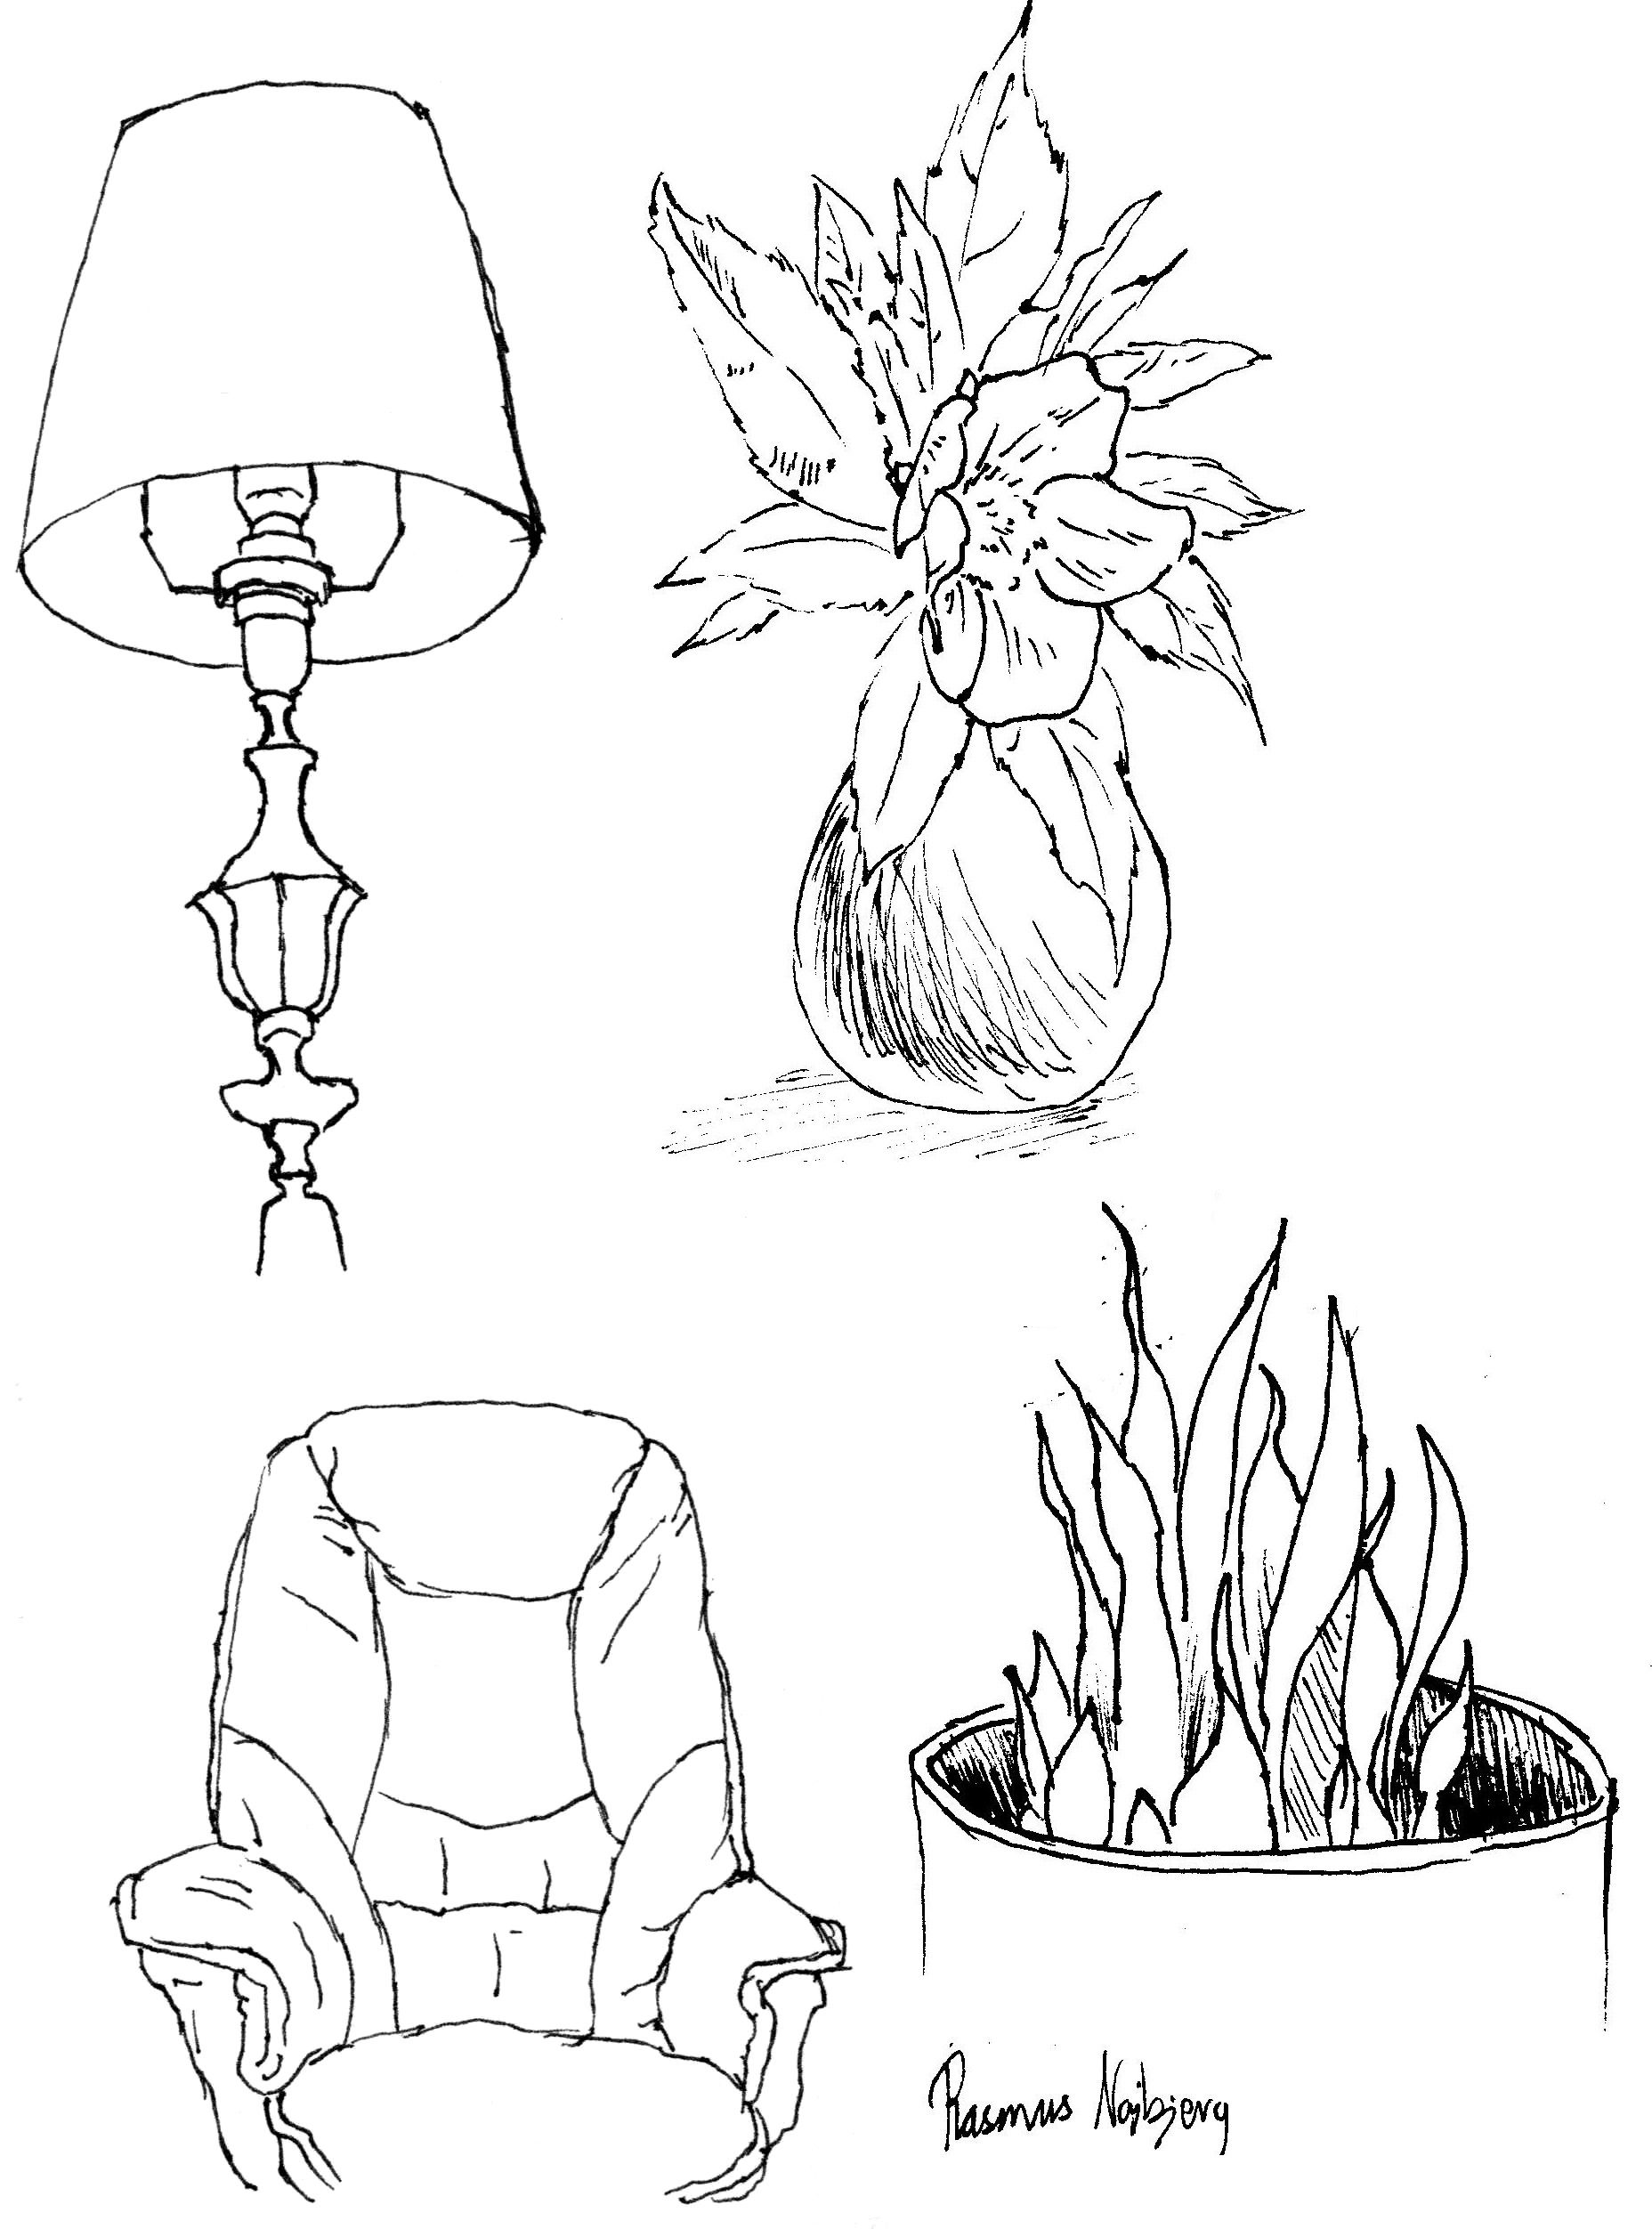 Living Room Sketch: Rasmus Najbjerg, Sketches In The Living Room.